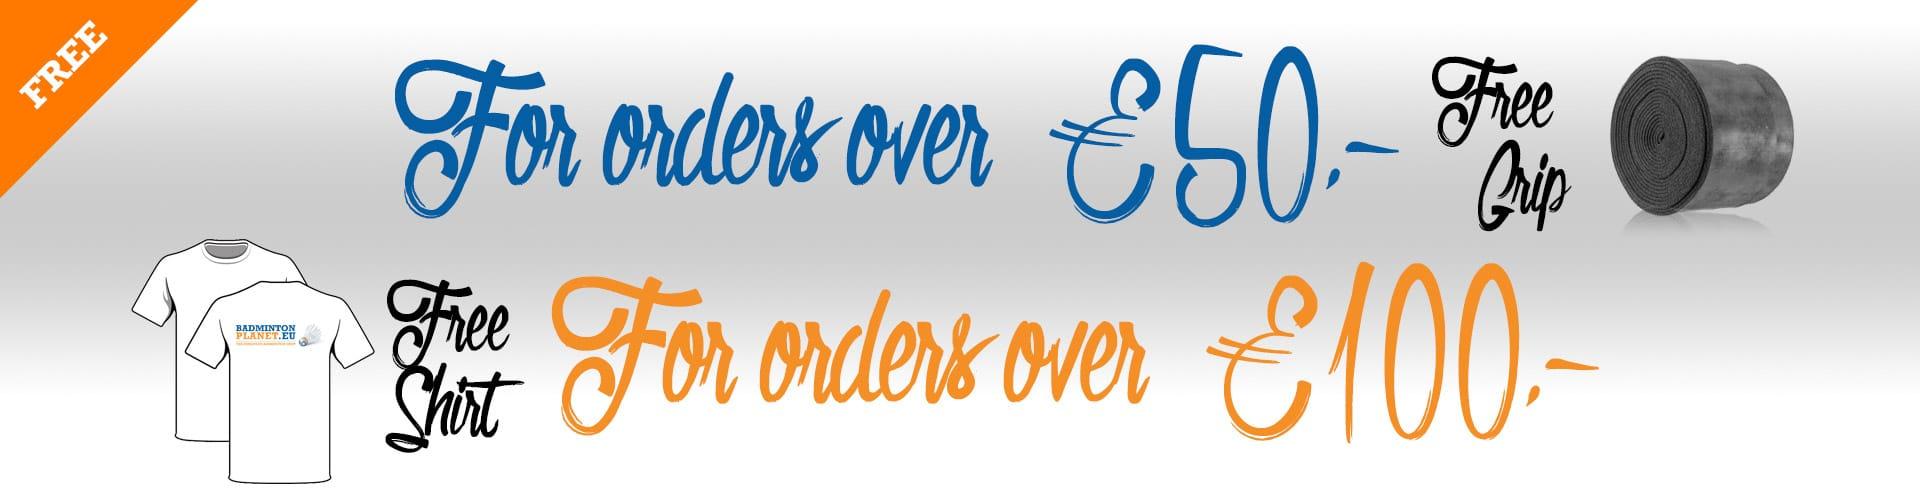 For orders over €50 free grip, For orders over €100 free shirt!